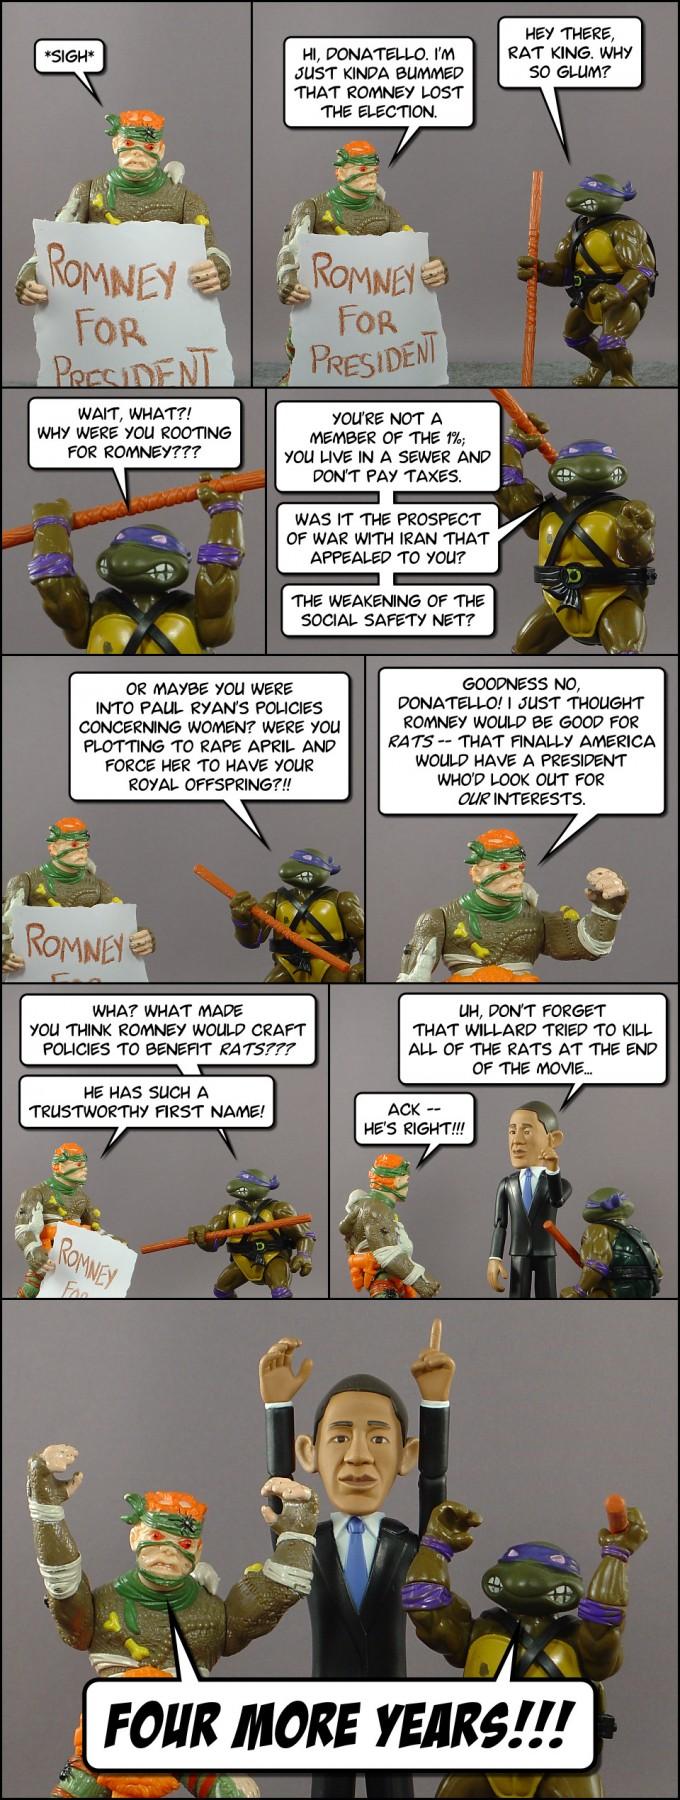 Dusty Plastic HELL #8: Lord Ha'ntaan's Politics